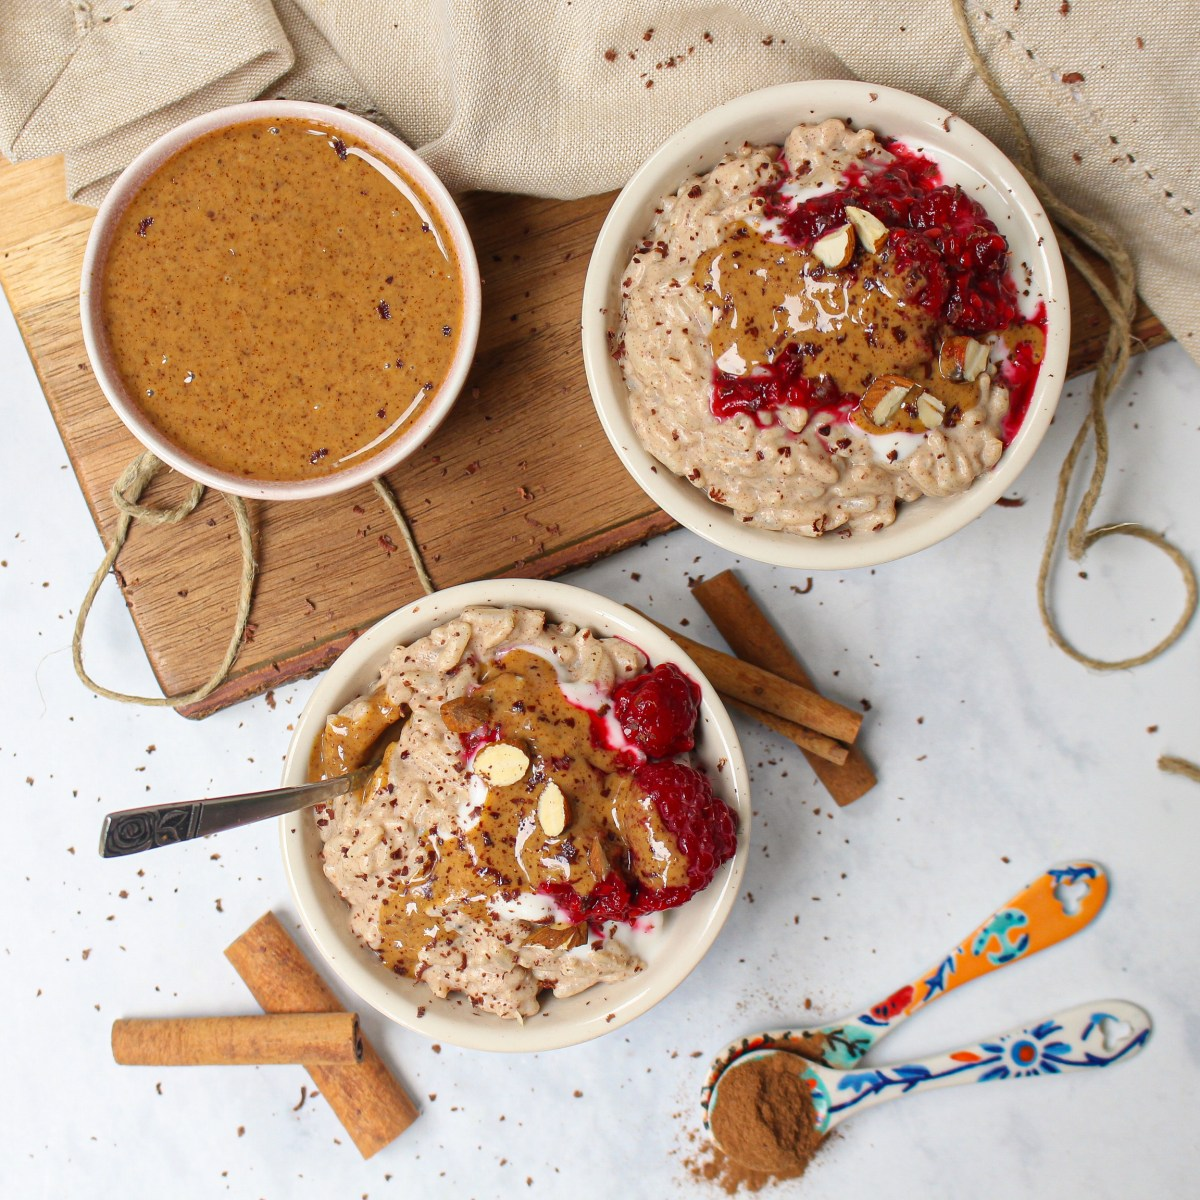 Almond and Cinnamon Rice Porridge